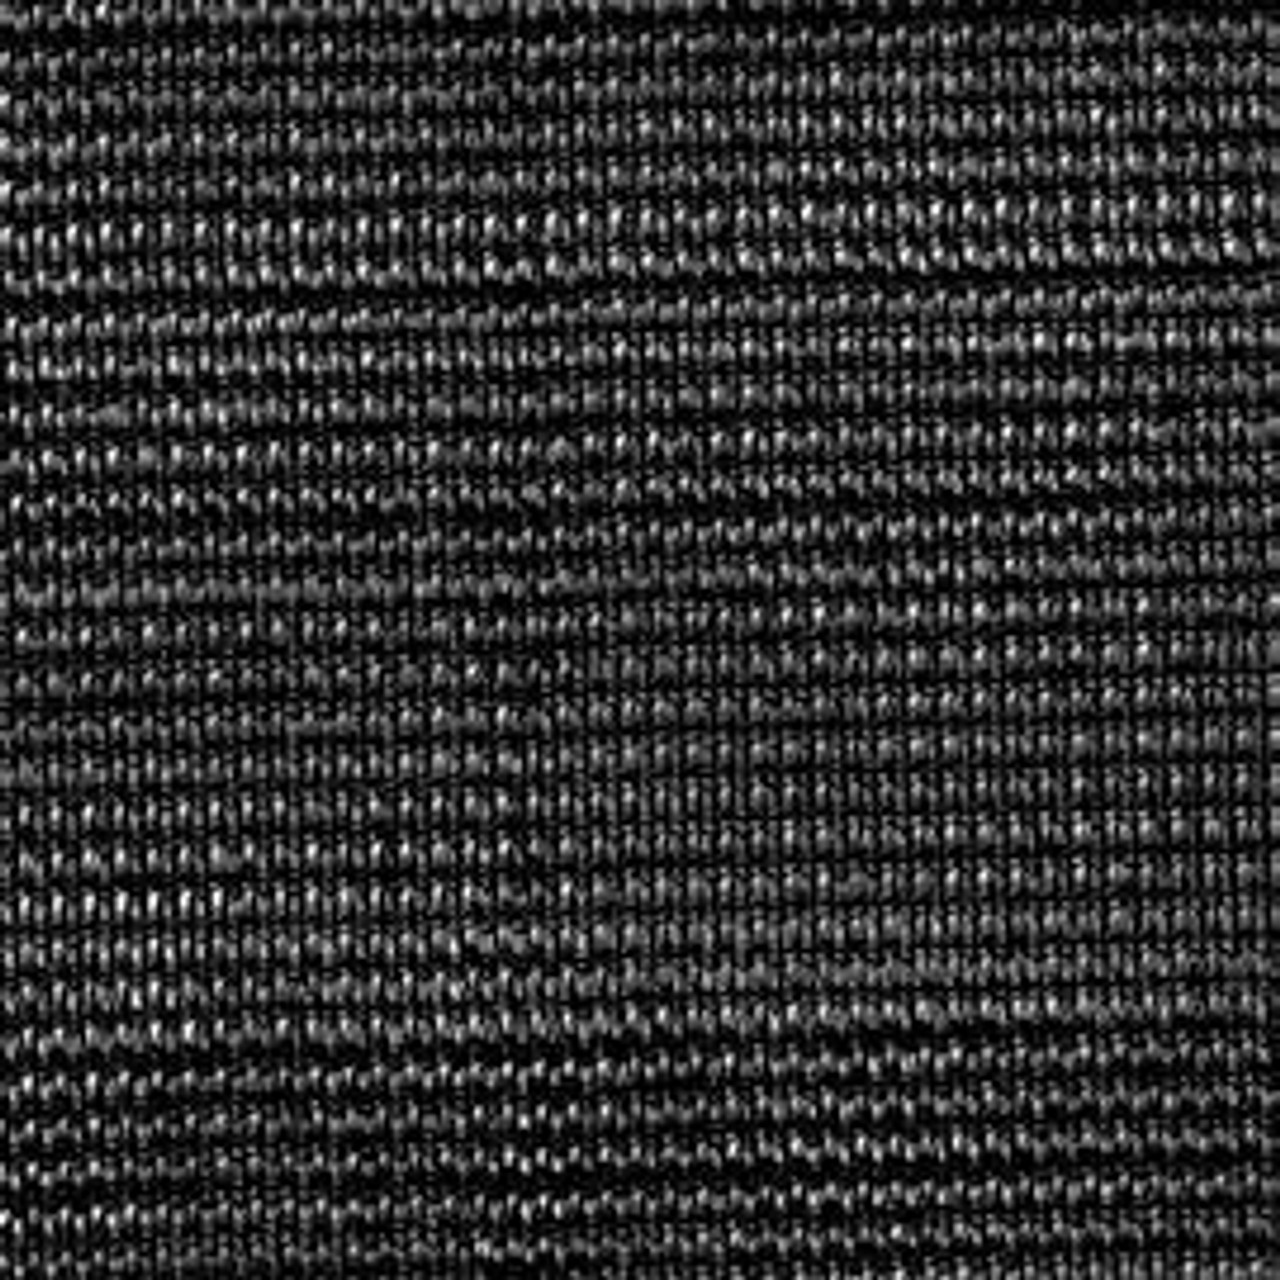 70% Knitted Polypropylene Tarps